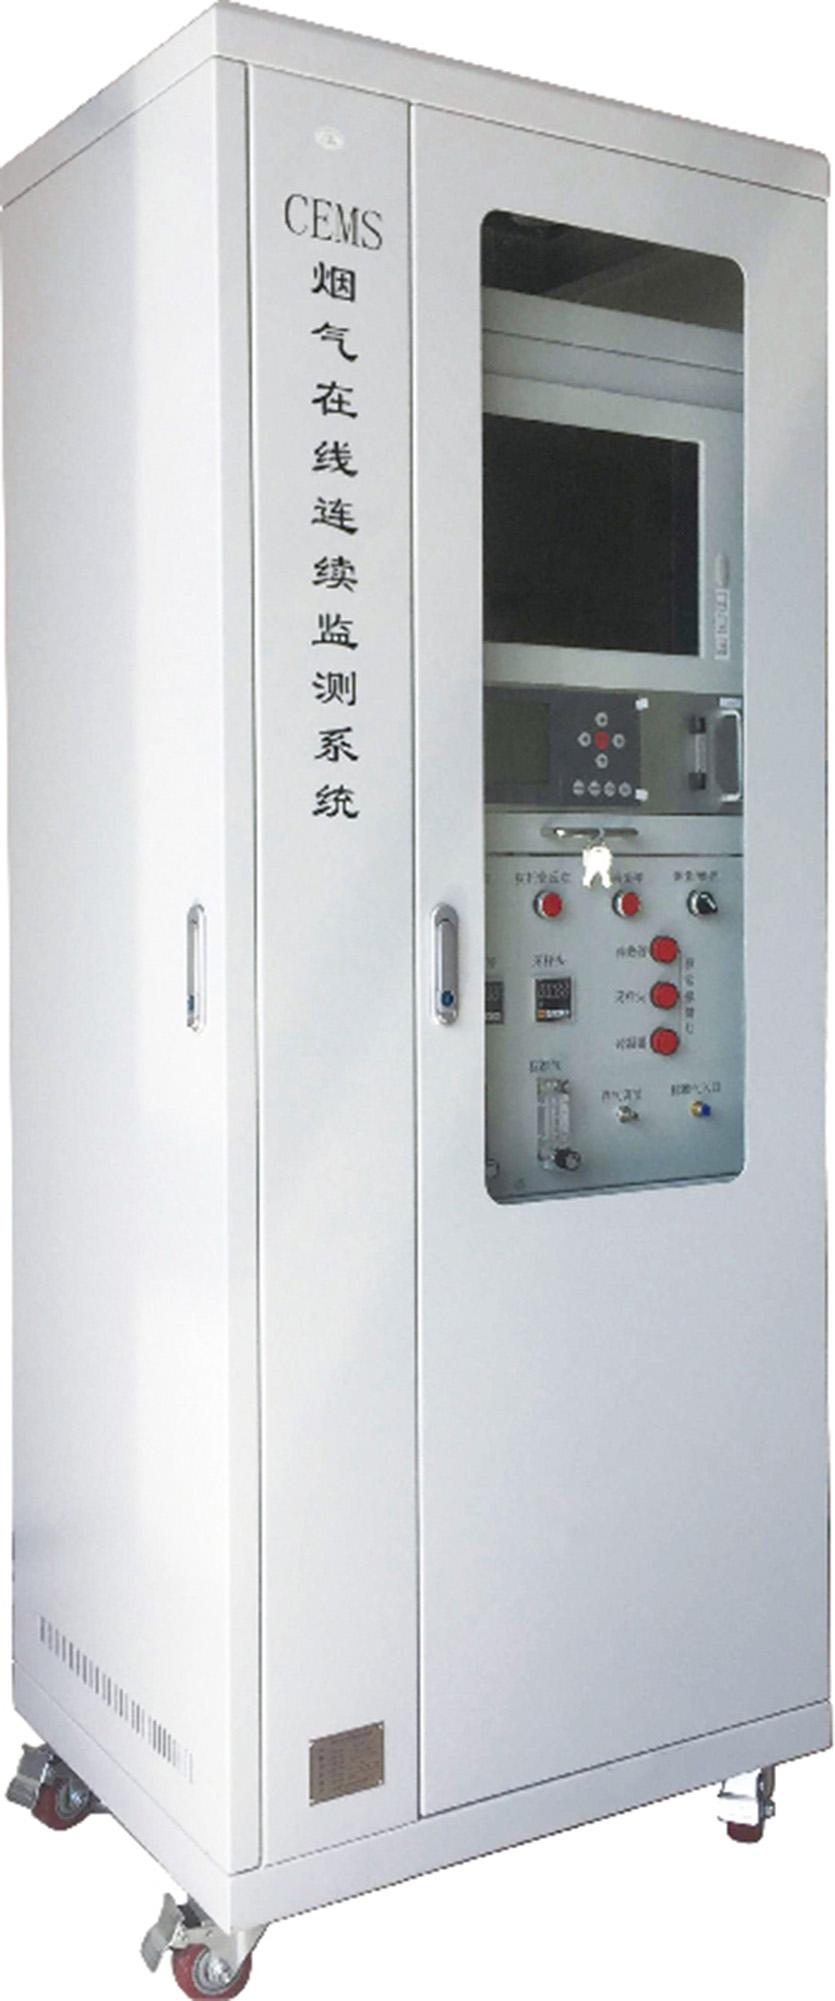 CEMS型烟气排放连续监测系统